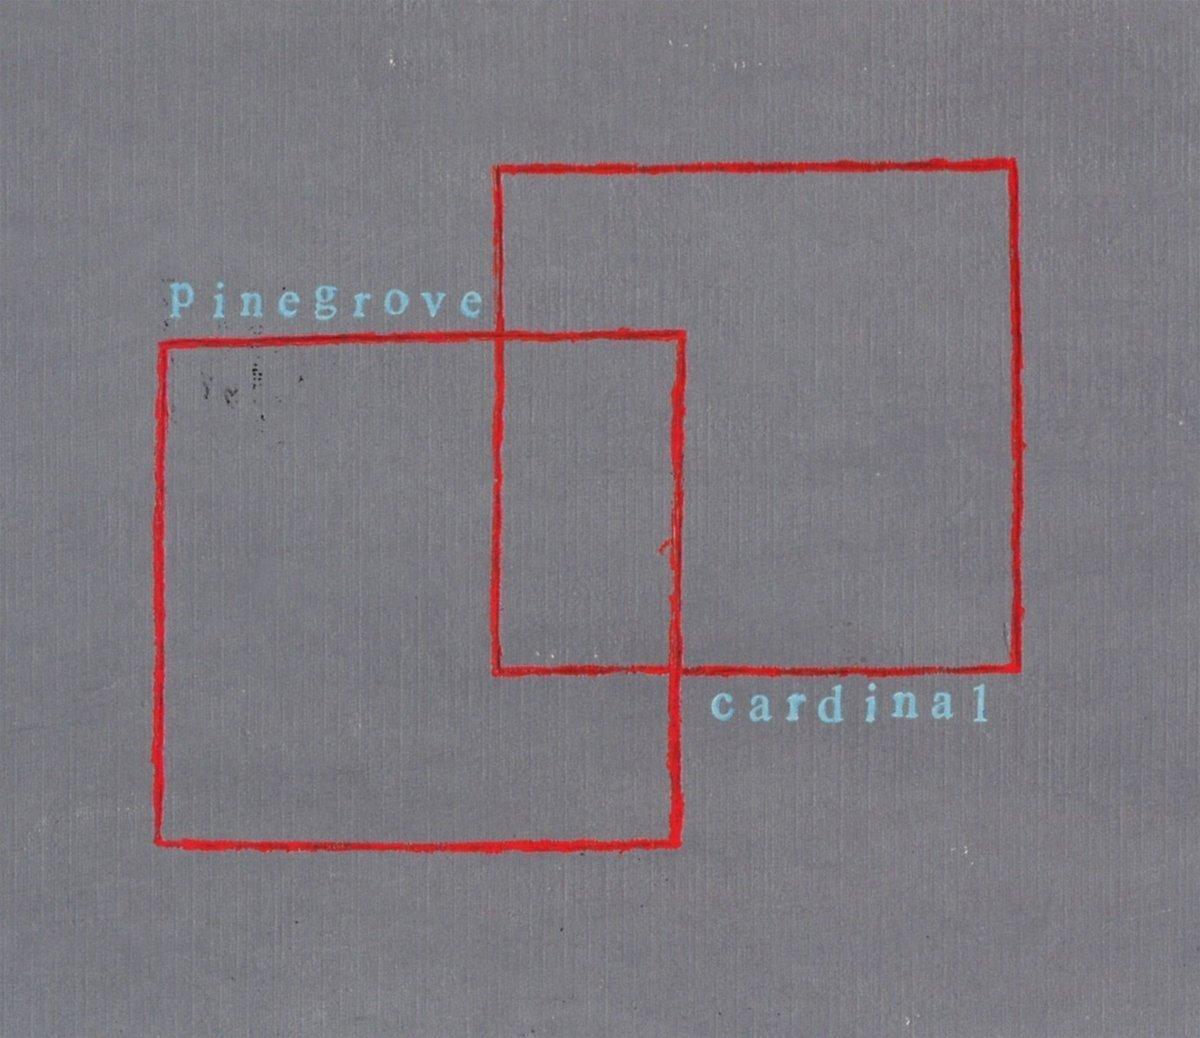 Pinegrove: Cardinal [Album Review]